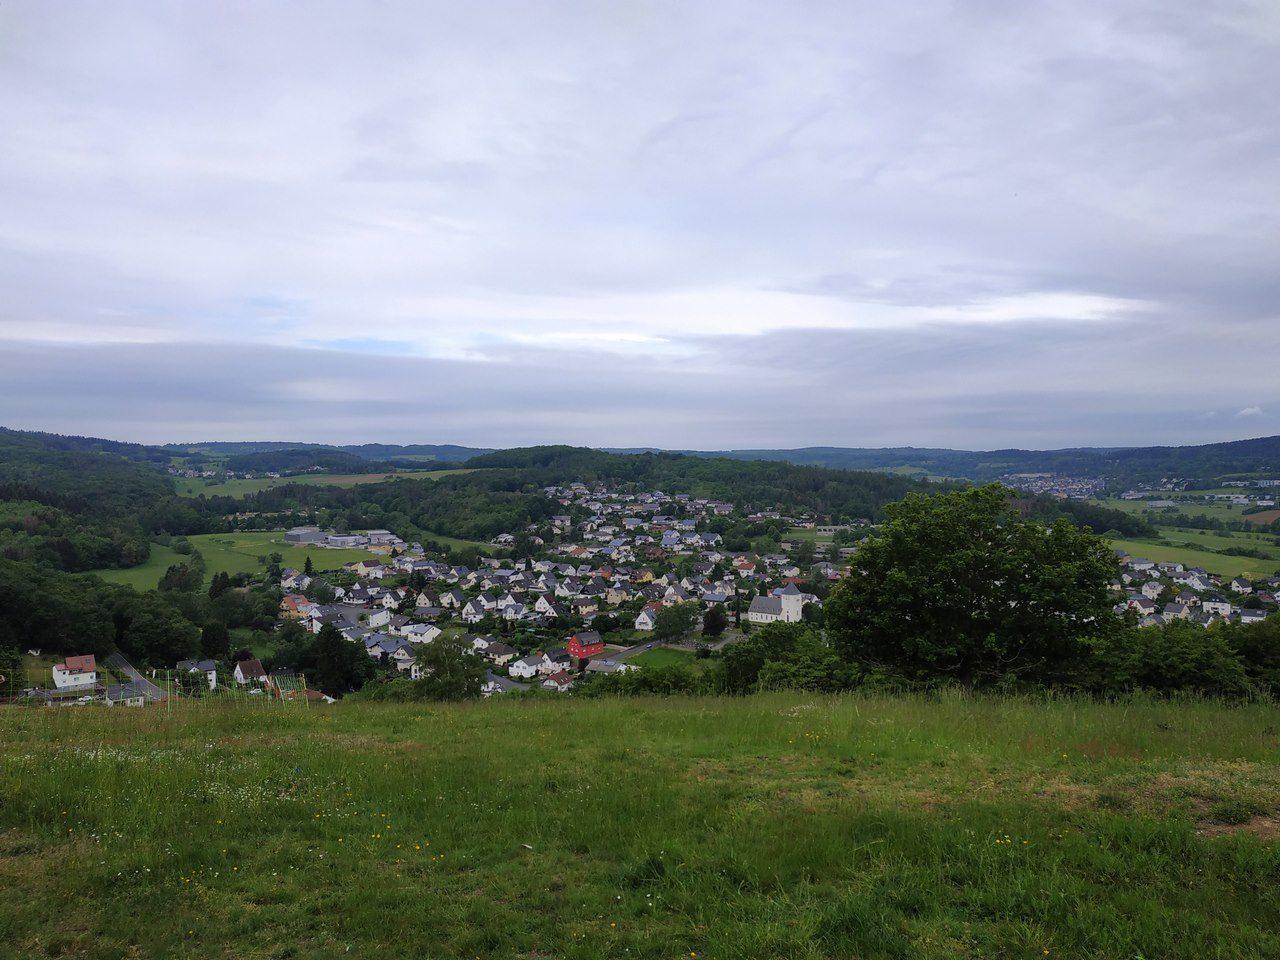 post_touren_waeller_tour_greifensteinschleife_5-1280-960.jpg